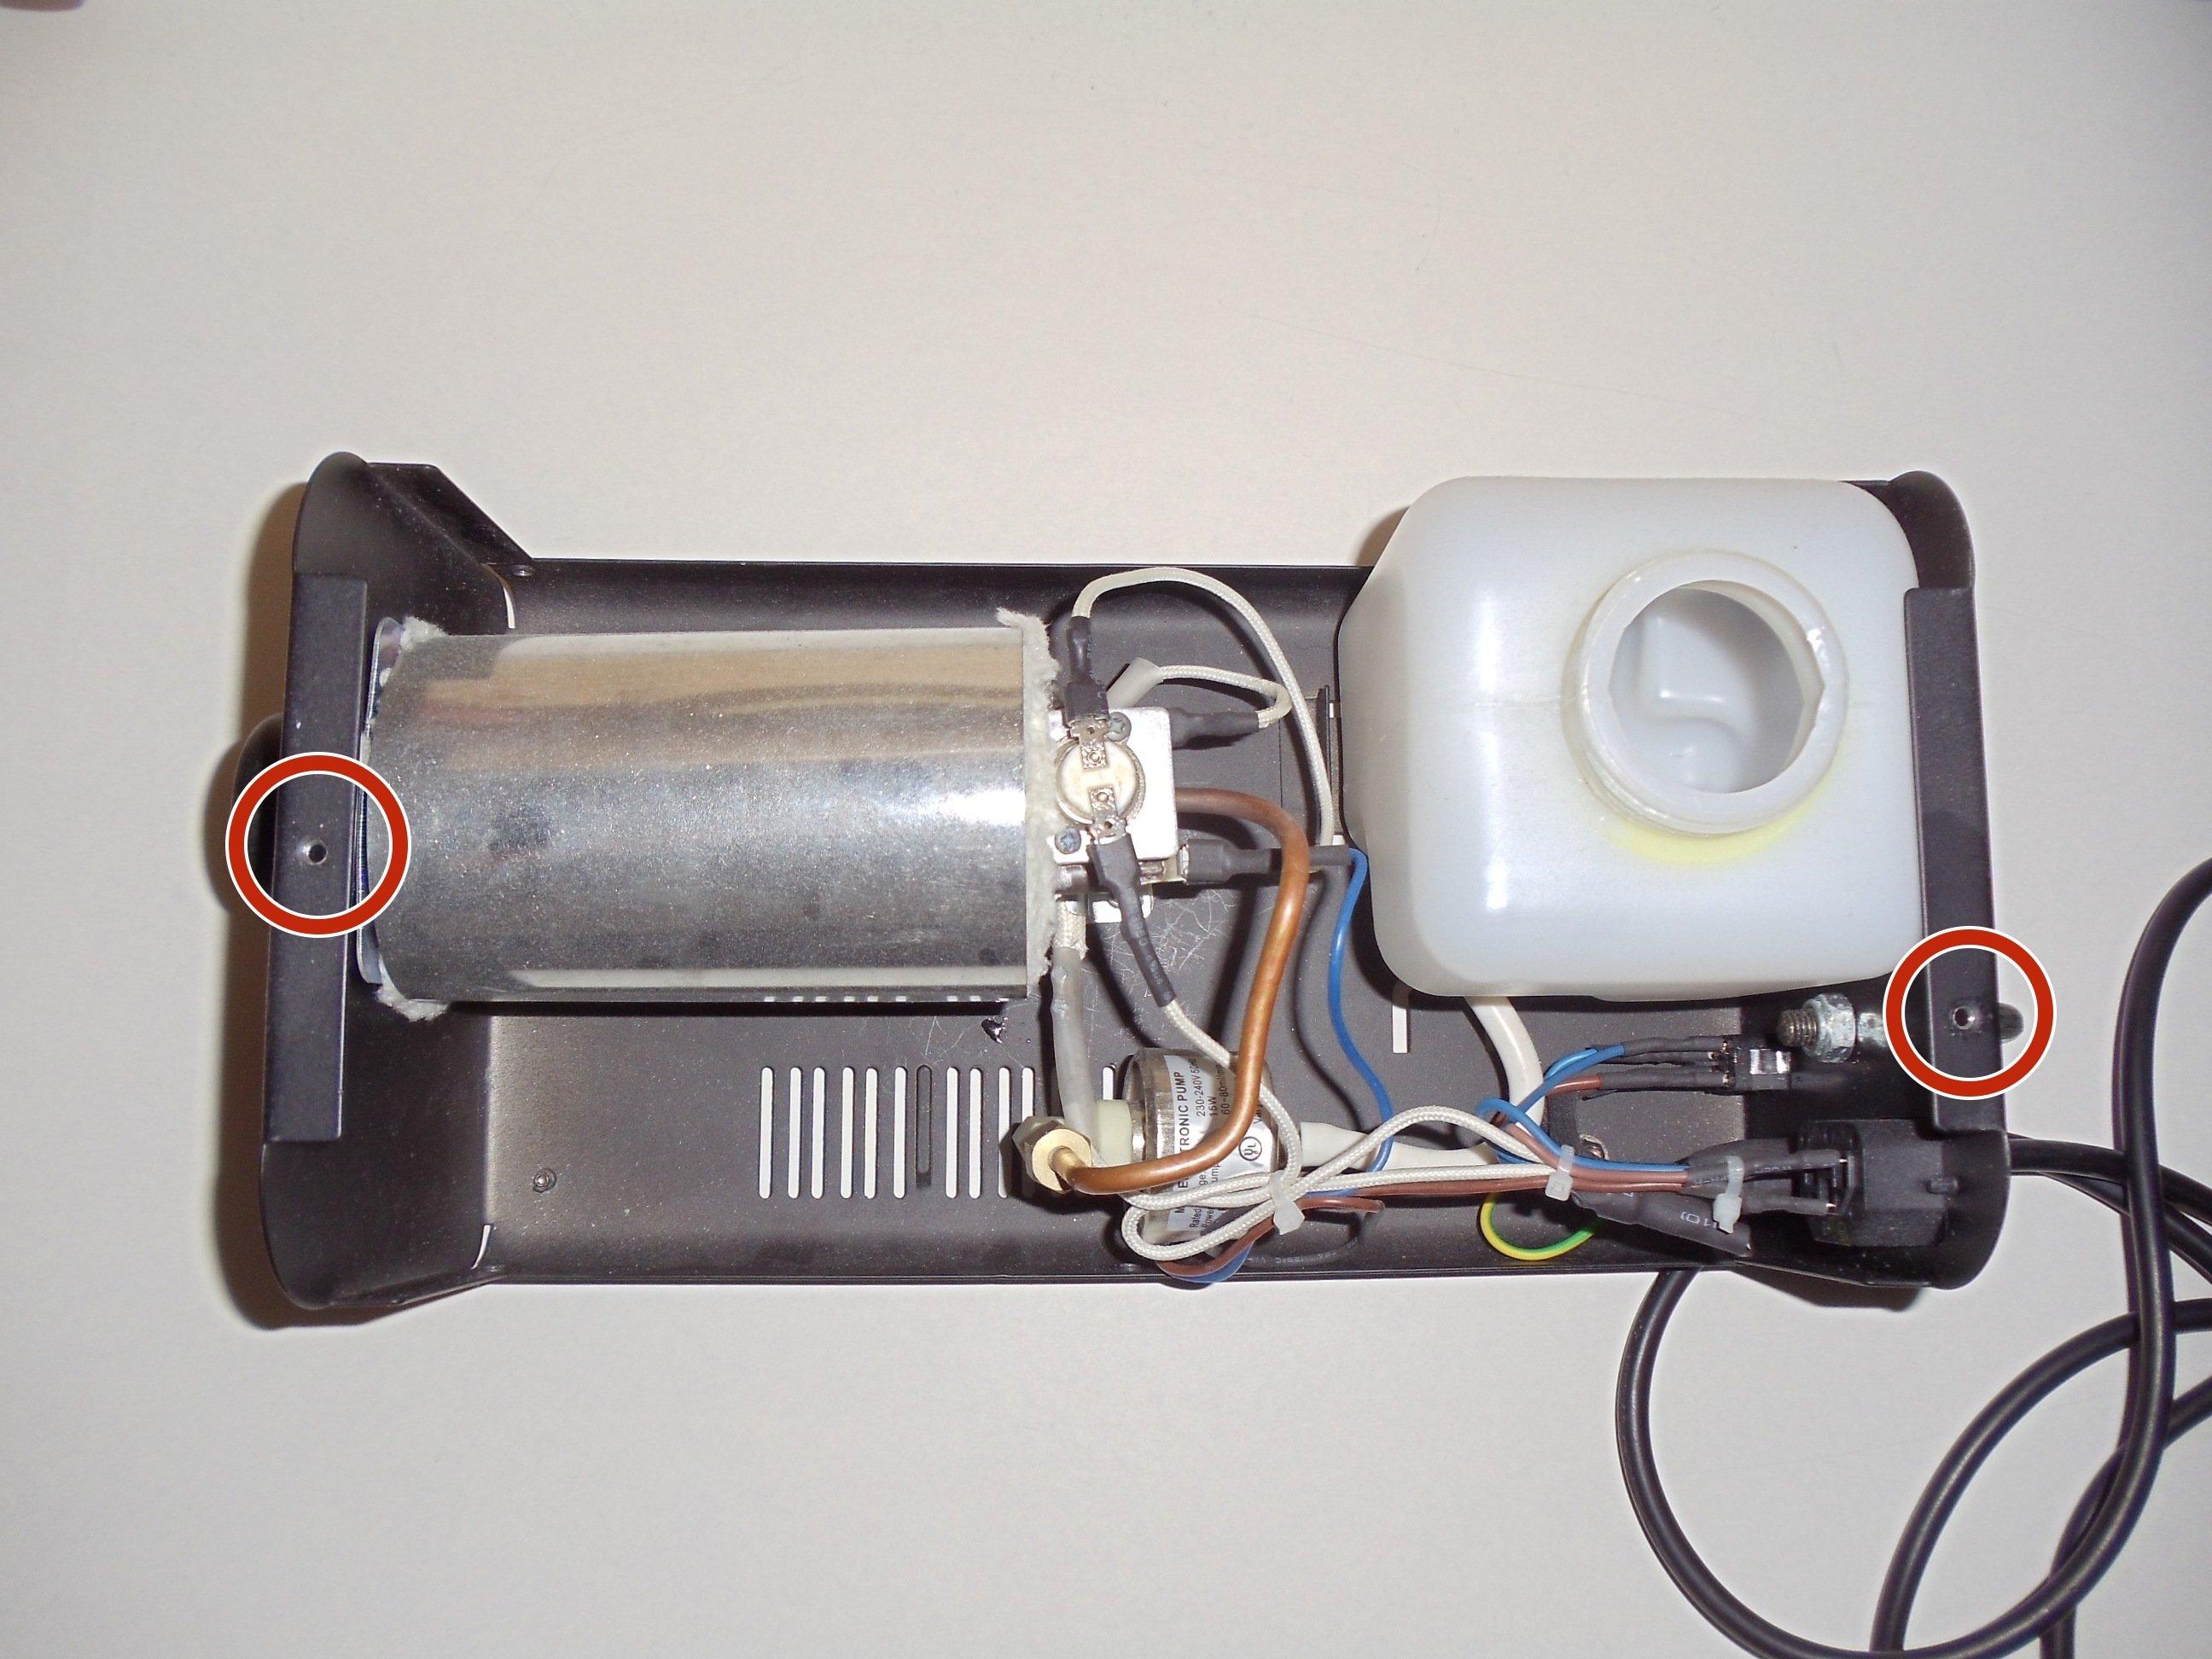 How to repair the Eurolite N-19 Fog Machine - iFixit Repair GuideiFixit